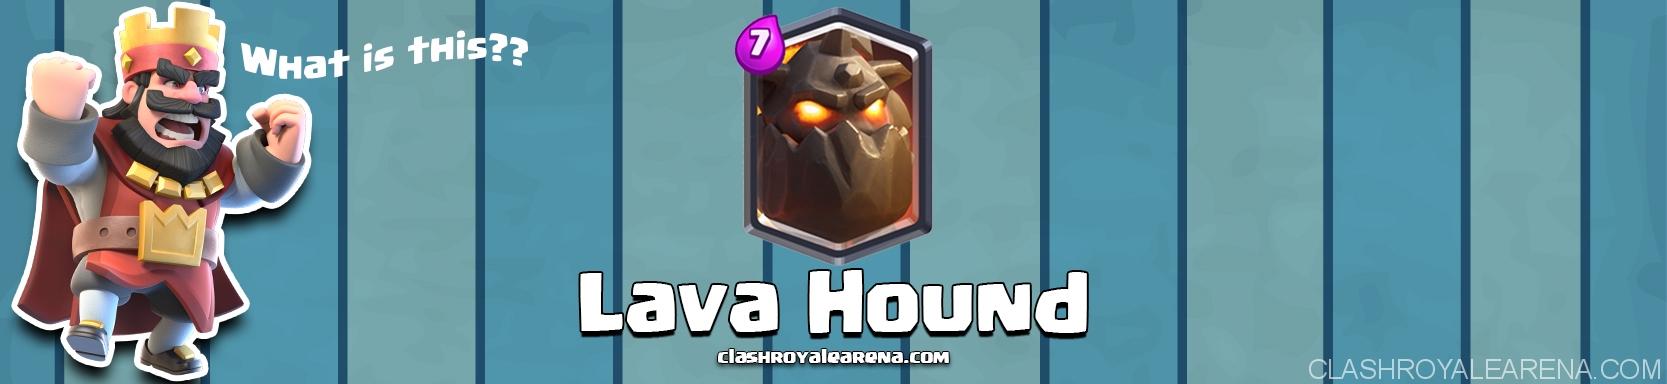 lava-hound-clash-royale